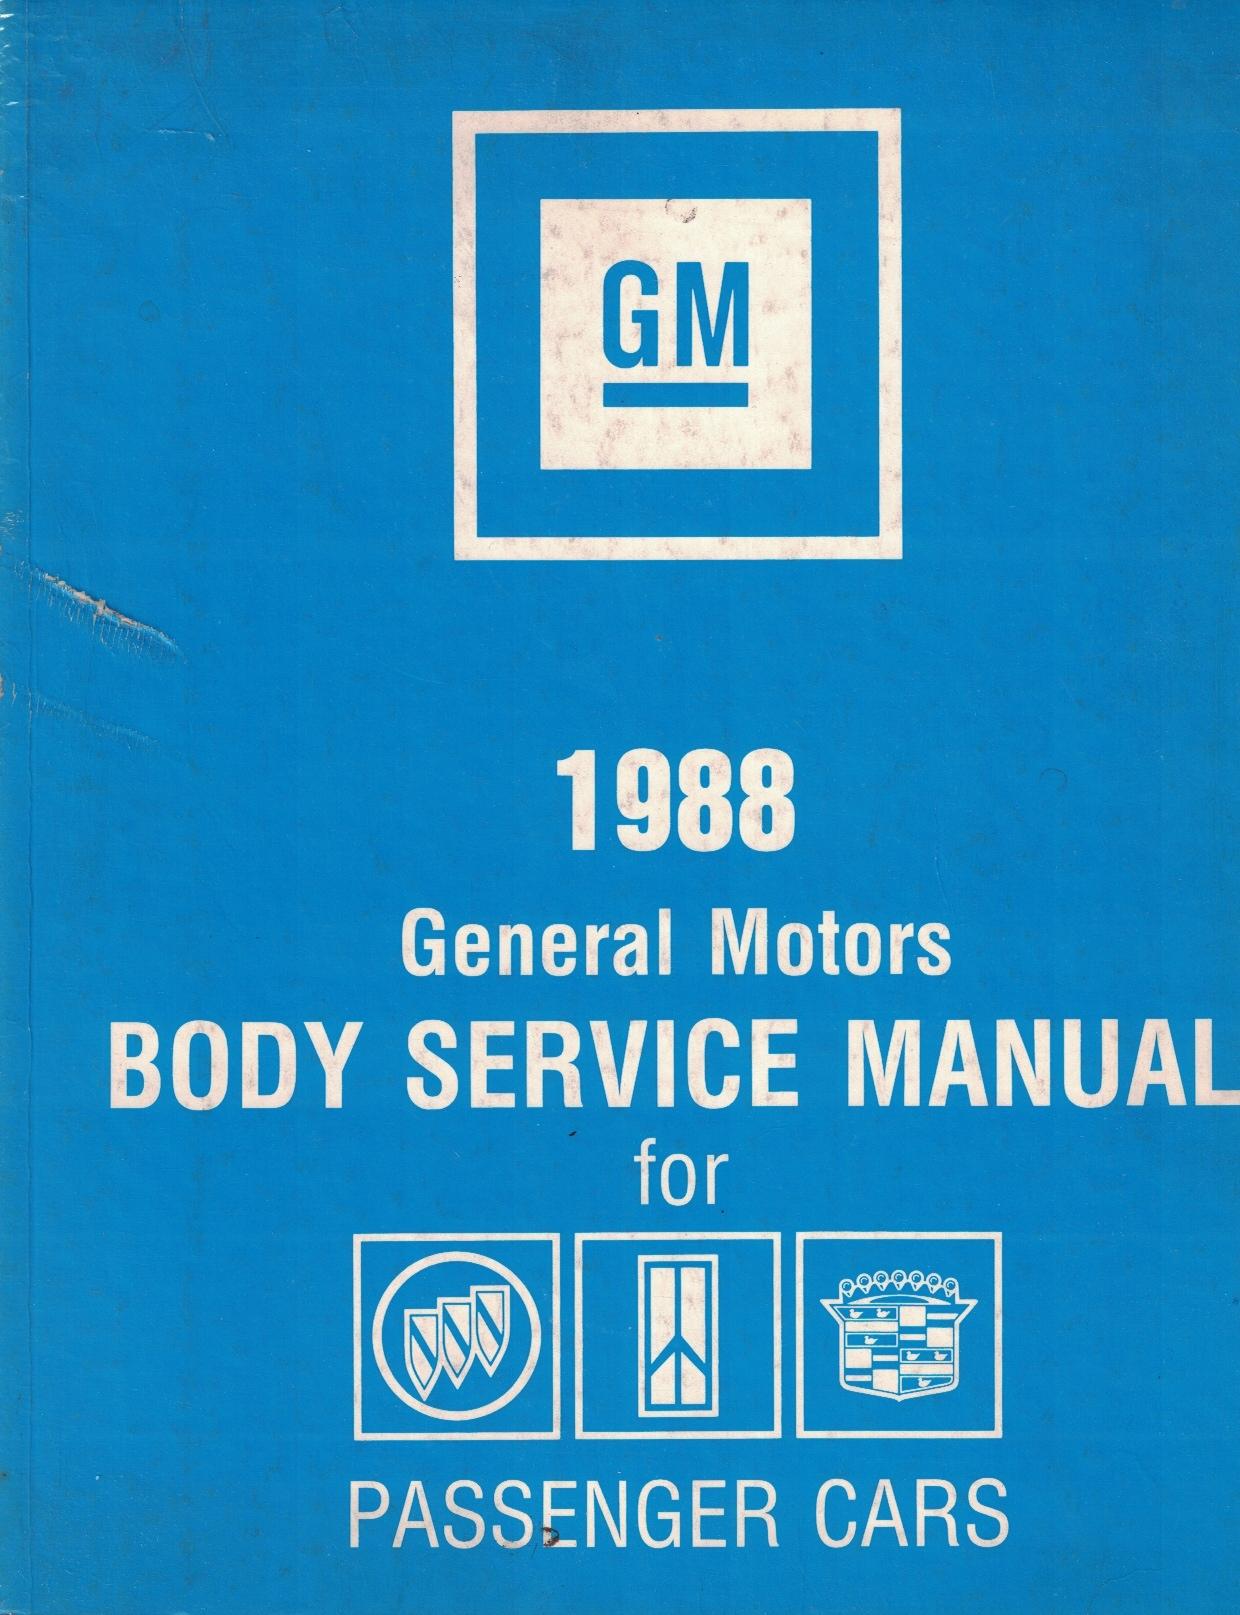 Image for 1988 General Motors Body Service Manual for Passenger Cars